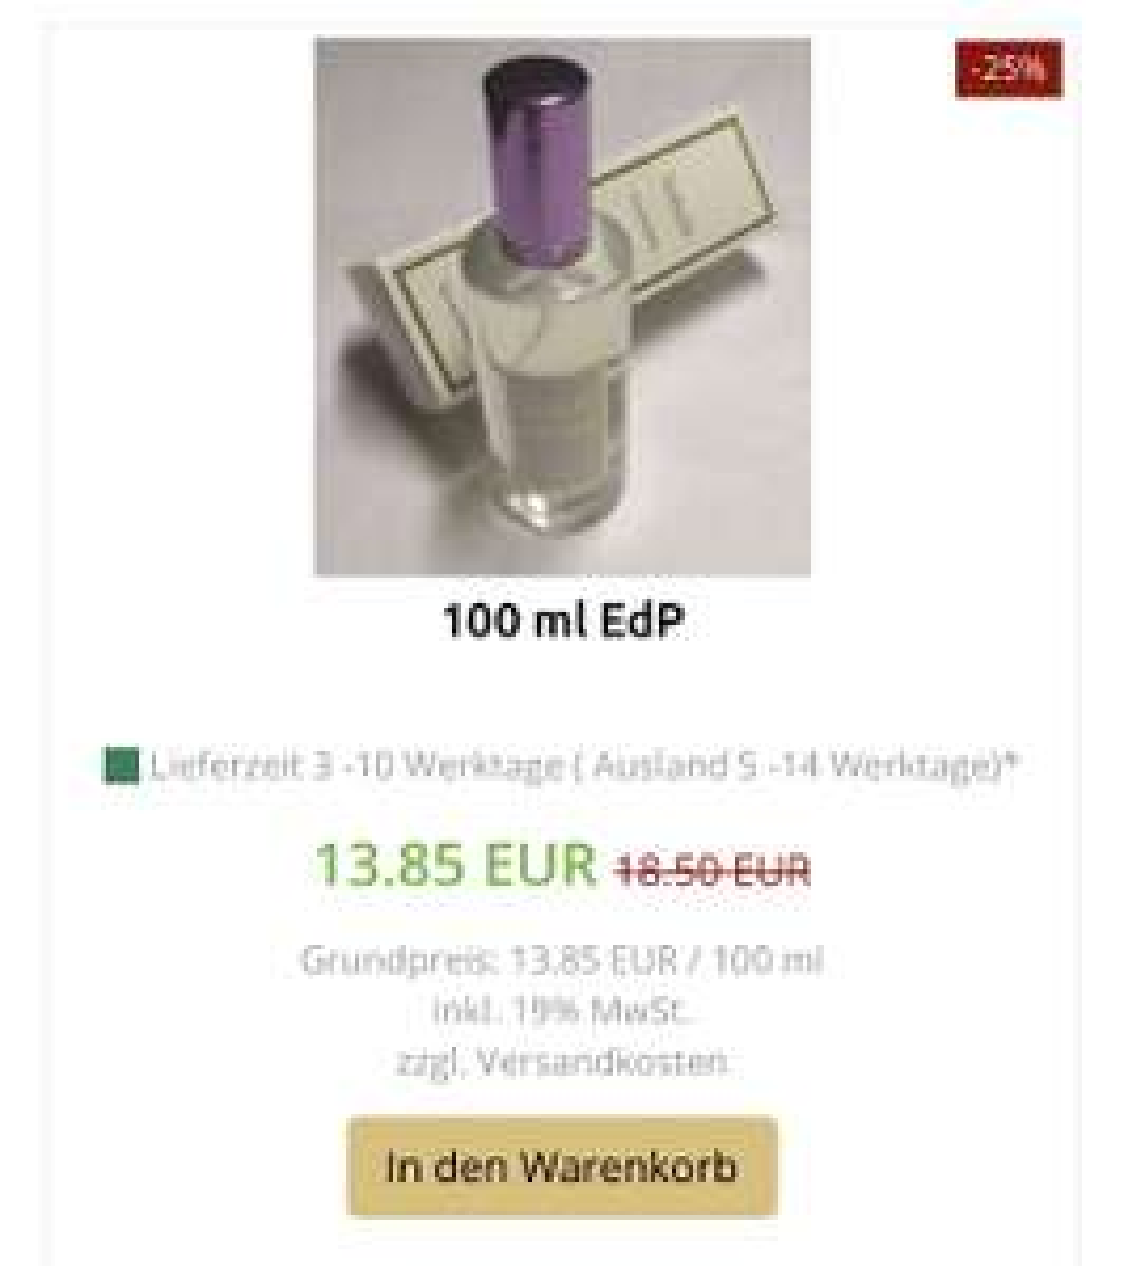 Parfüm Dupes - Vebellé Cosmetics